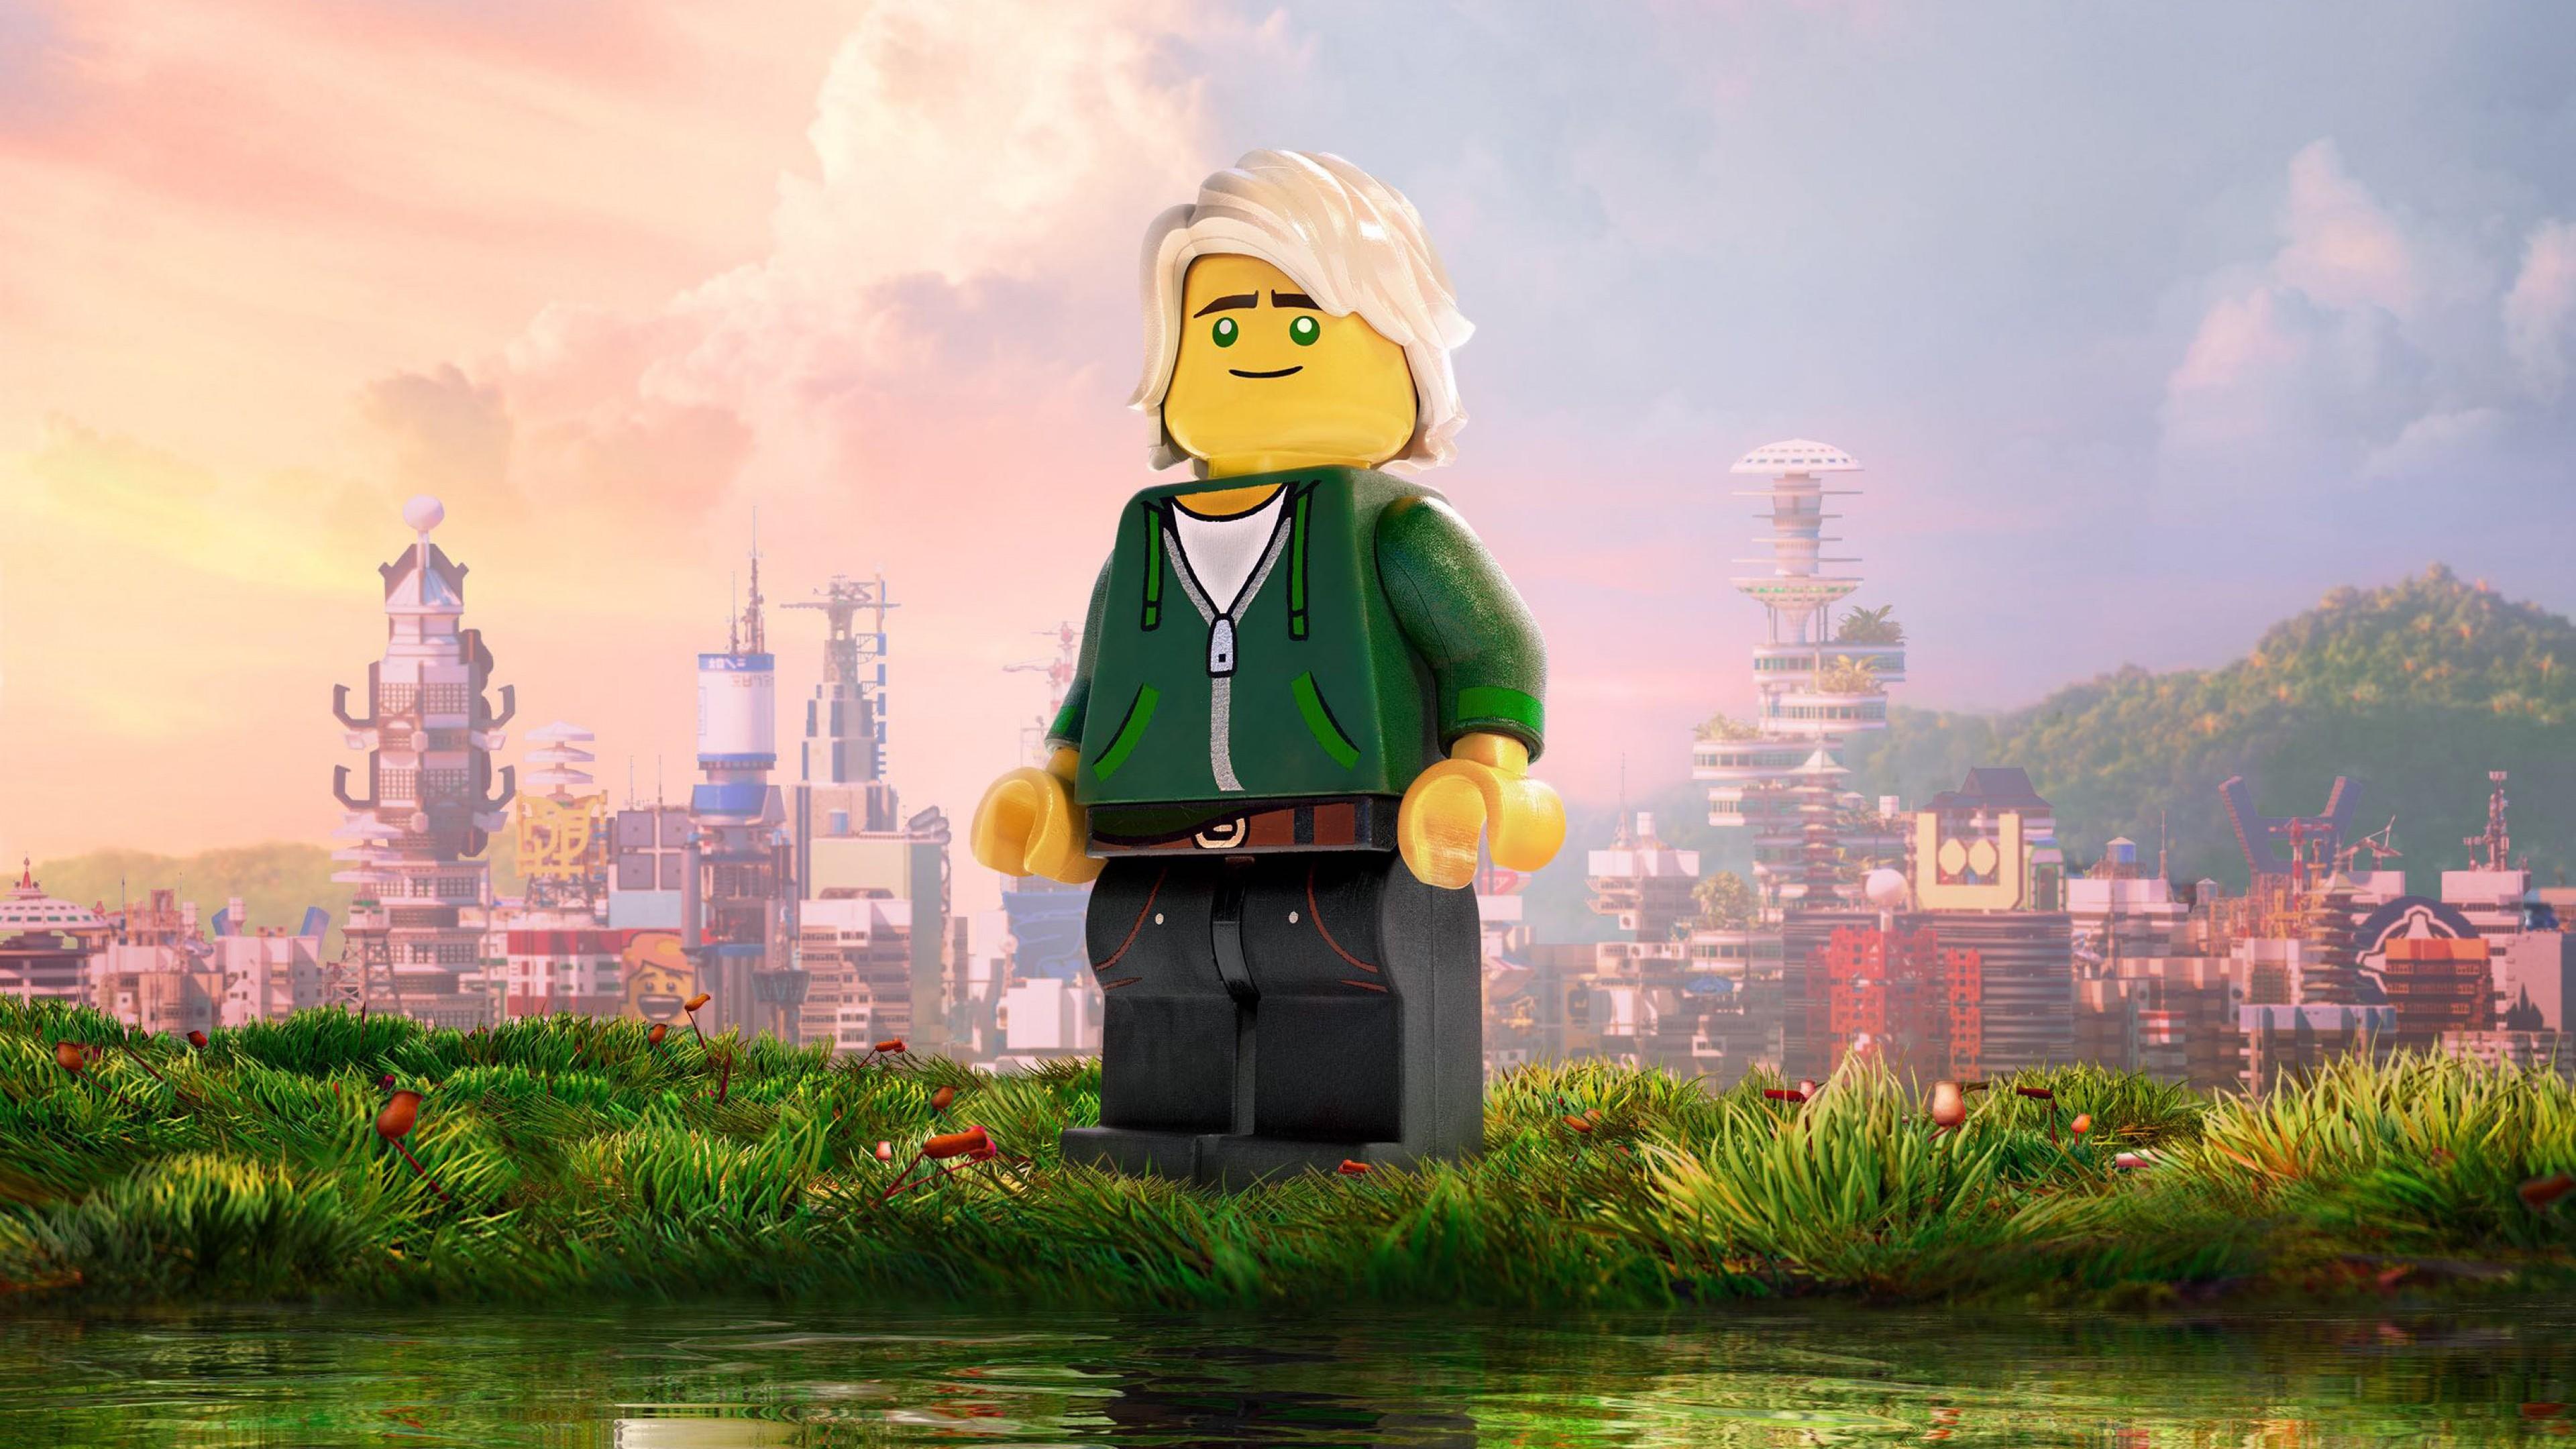 Tags: The LEGO Ninjago Movie, HD …